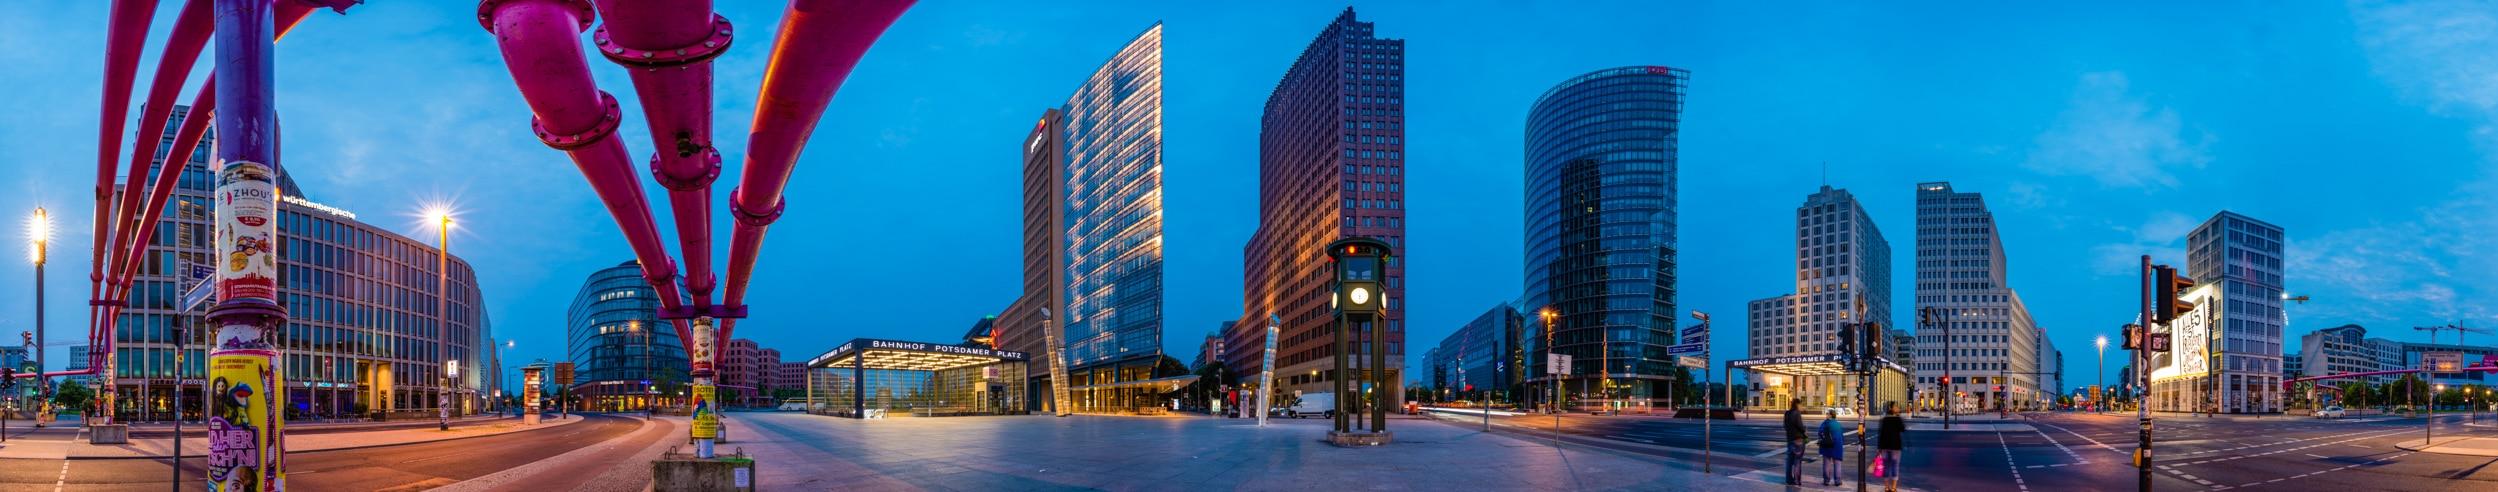 Panorama Potsdamer Platz , (Foto copyright - Frank Weber - Berlin - www.fotologbuch.de), reduziert auf 2500x492 Pixel, Originalgrösse 49742x9799 Pixel